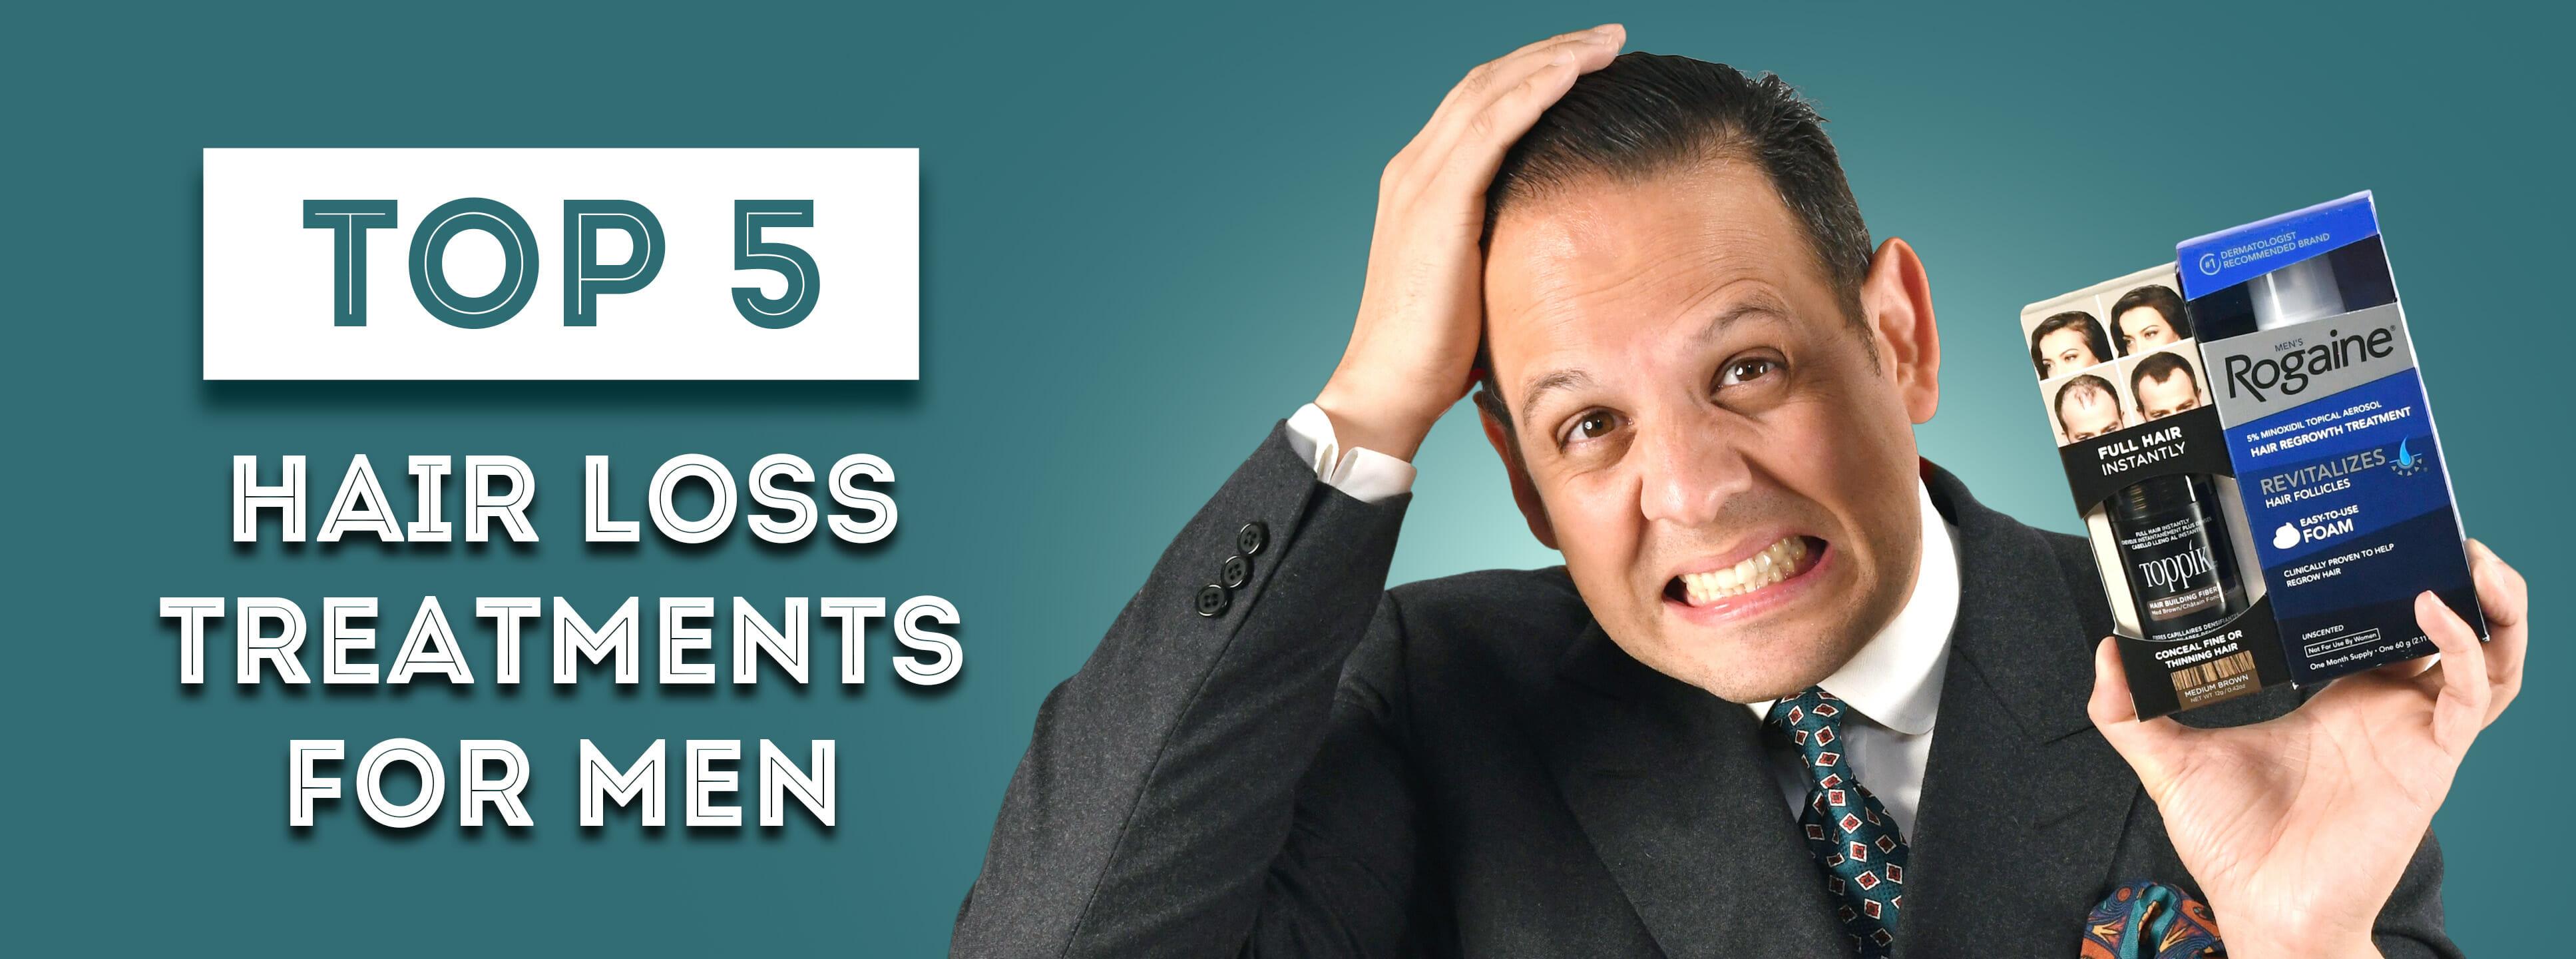 Top 5 Hair Loss Treatments for Men